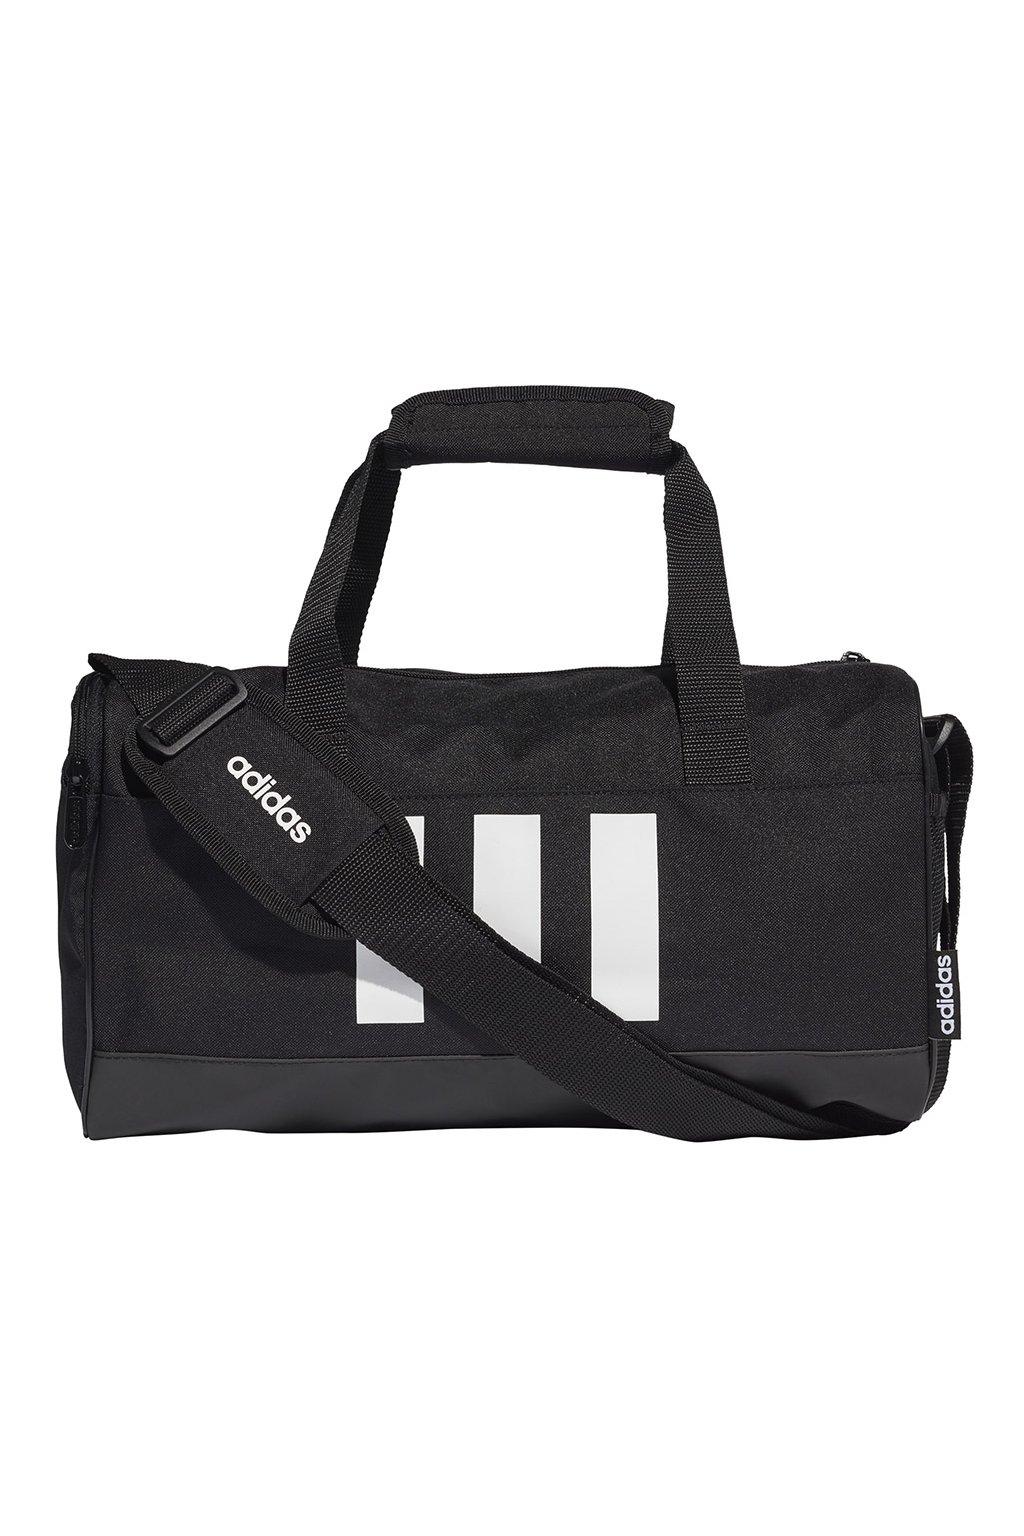 Taška Adidas 3 Stripes Duffle XS čierna GE1238